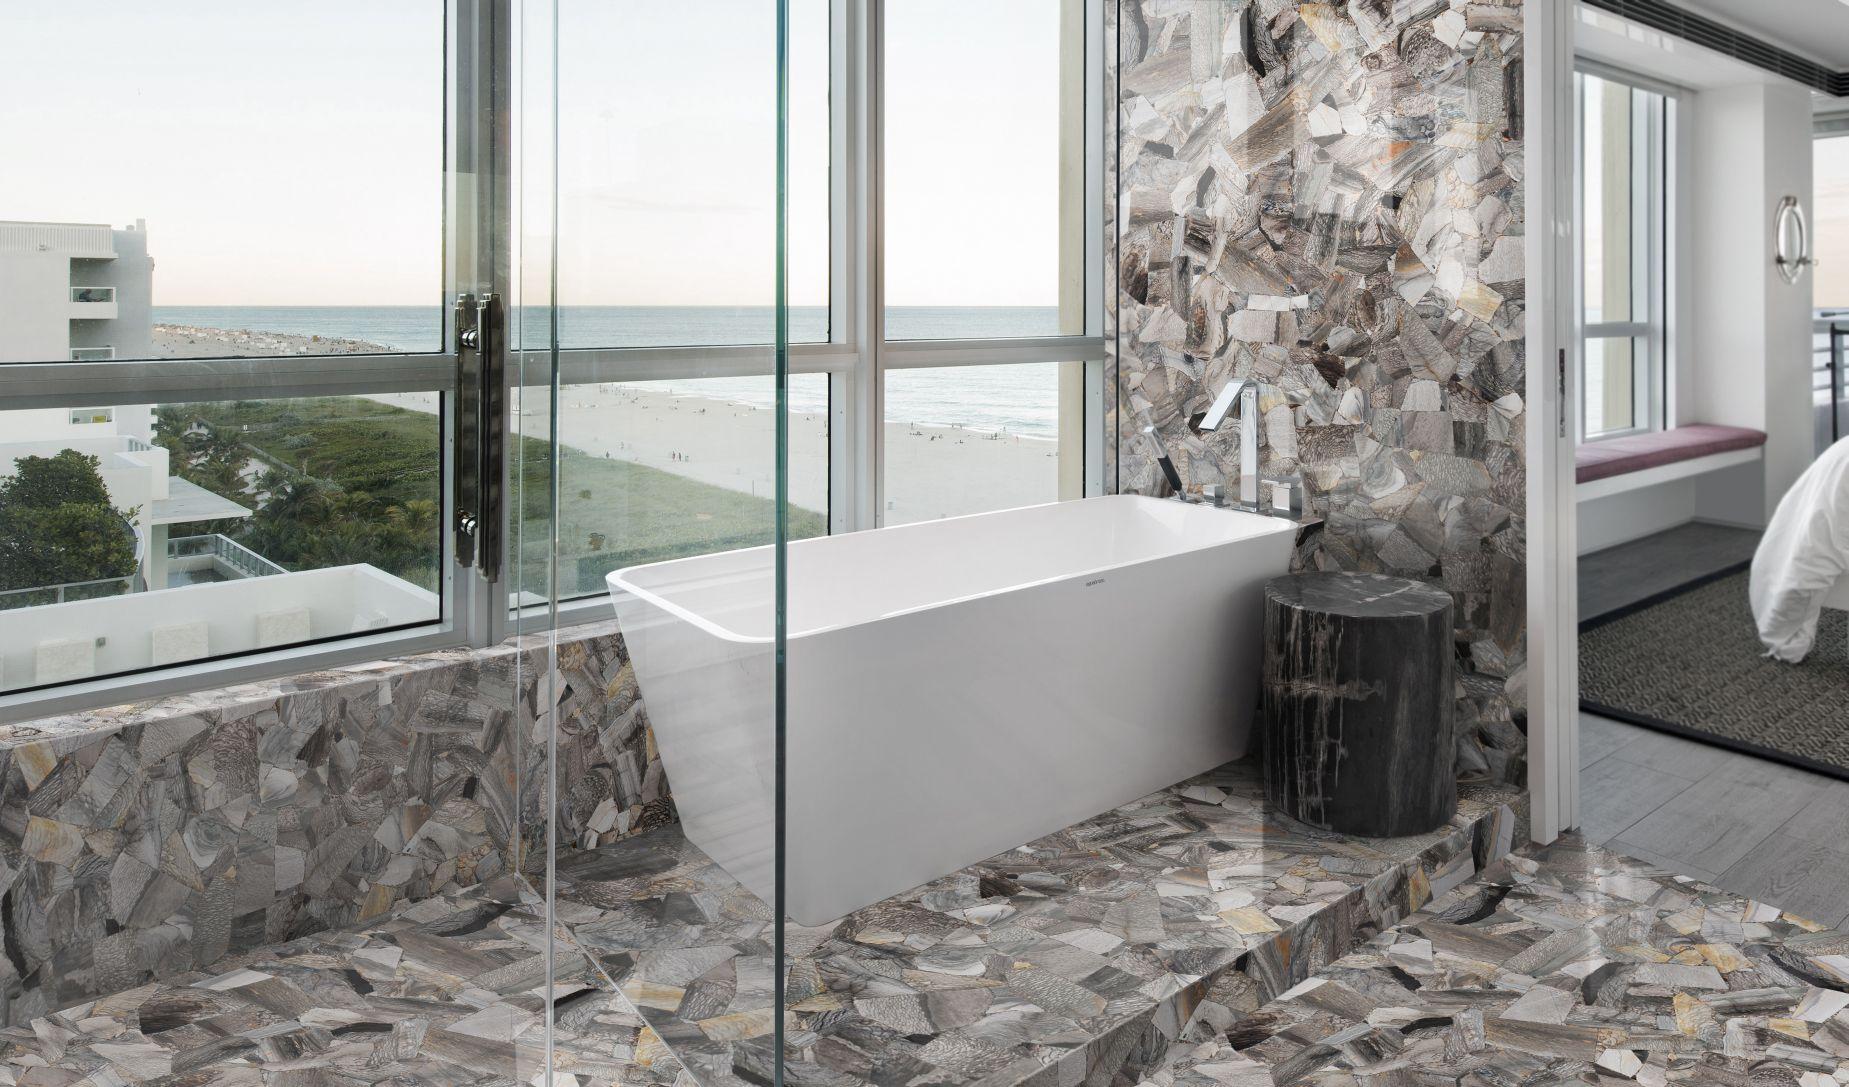 jasper selflint bathroom